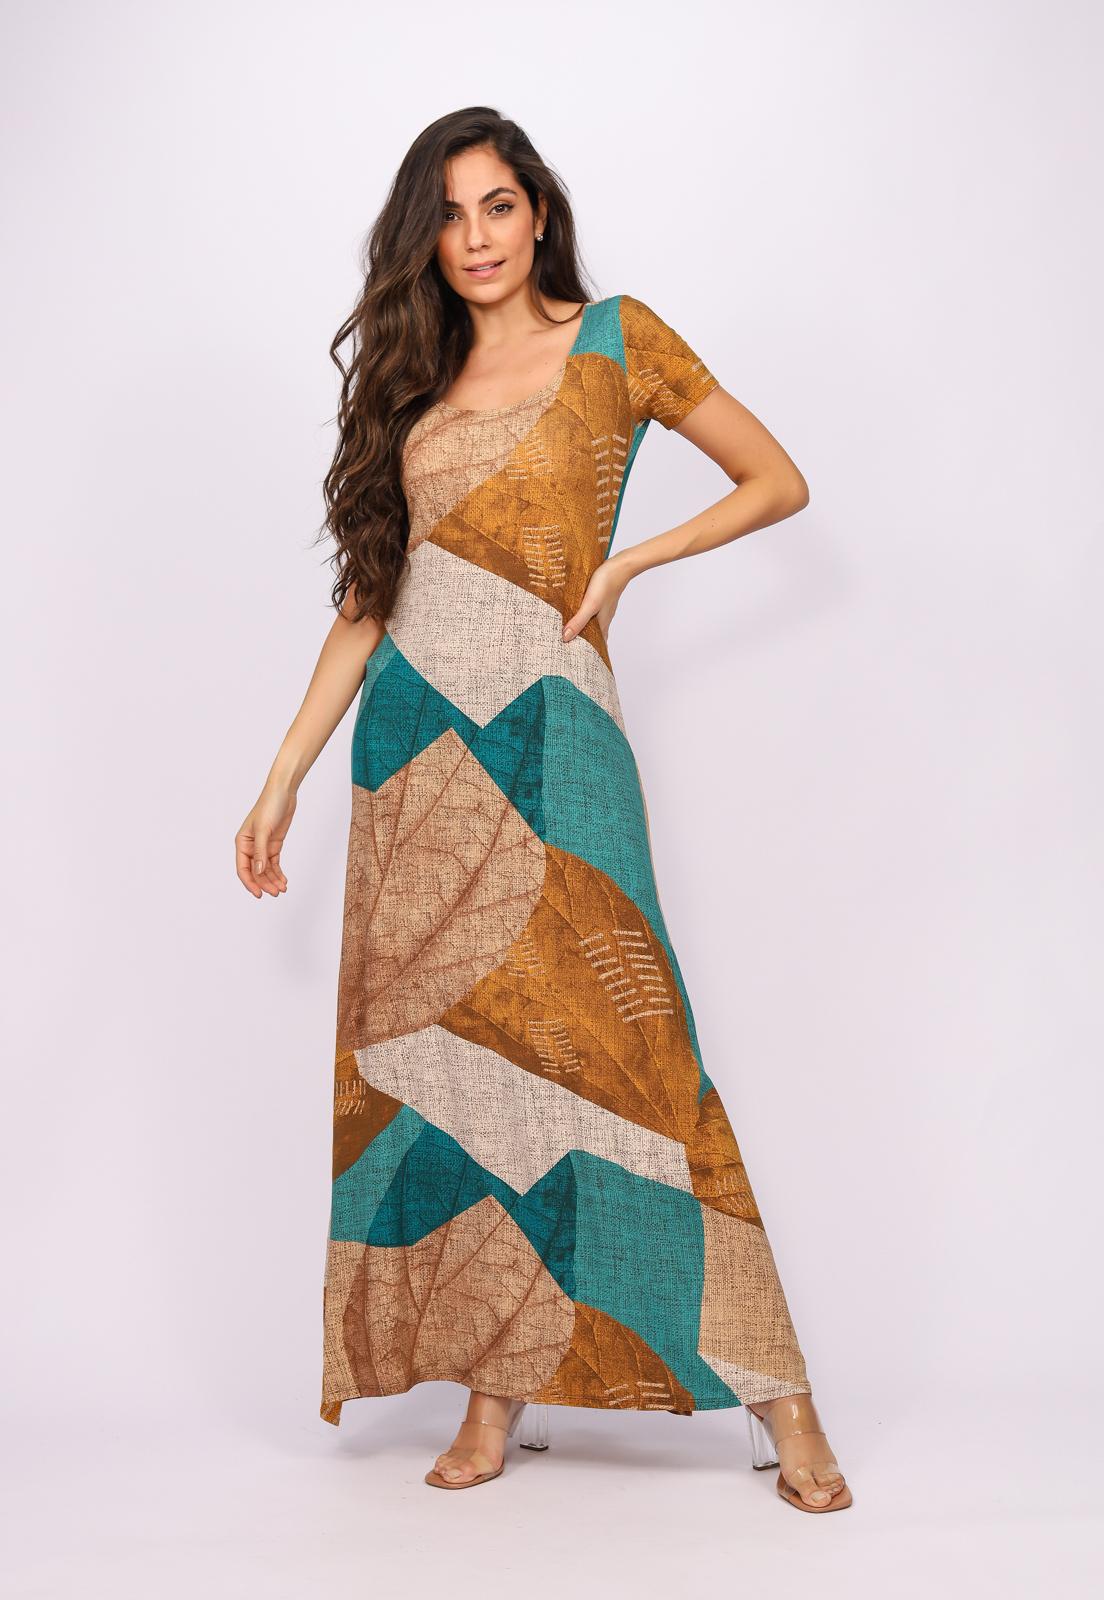 Vestido Longo Malha Gola Canoa Manga Curta Folhas de Outono